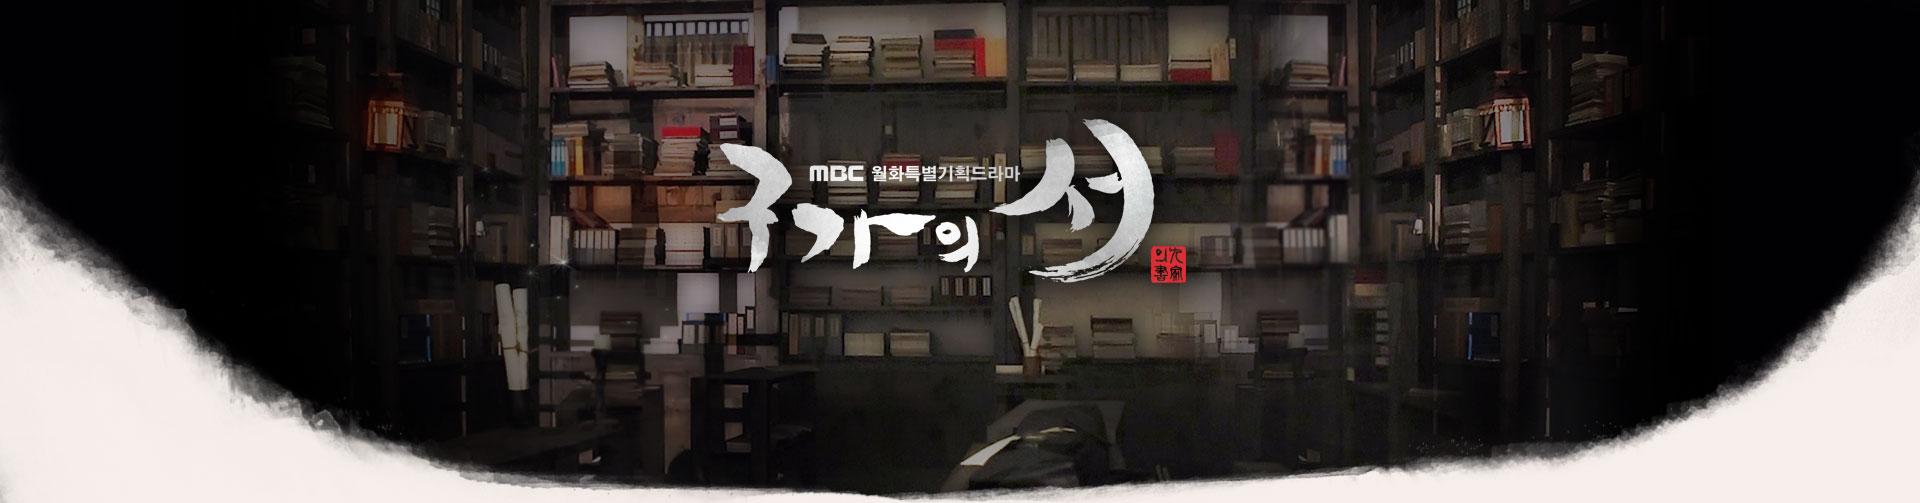 MBC 월화특별기획드라마 구가의 서